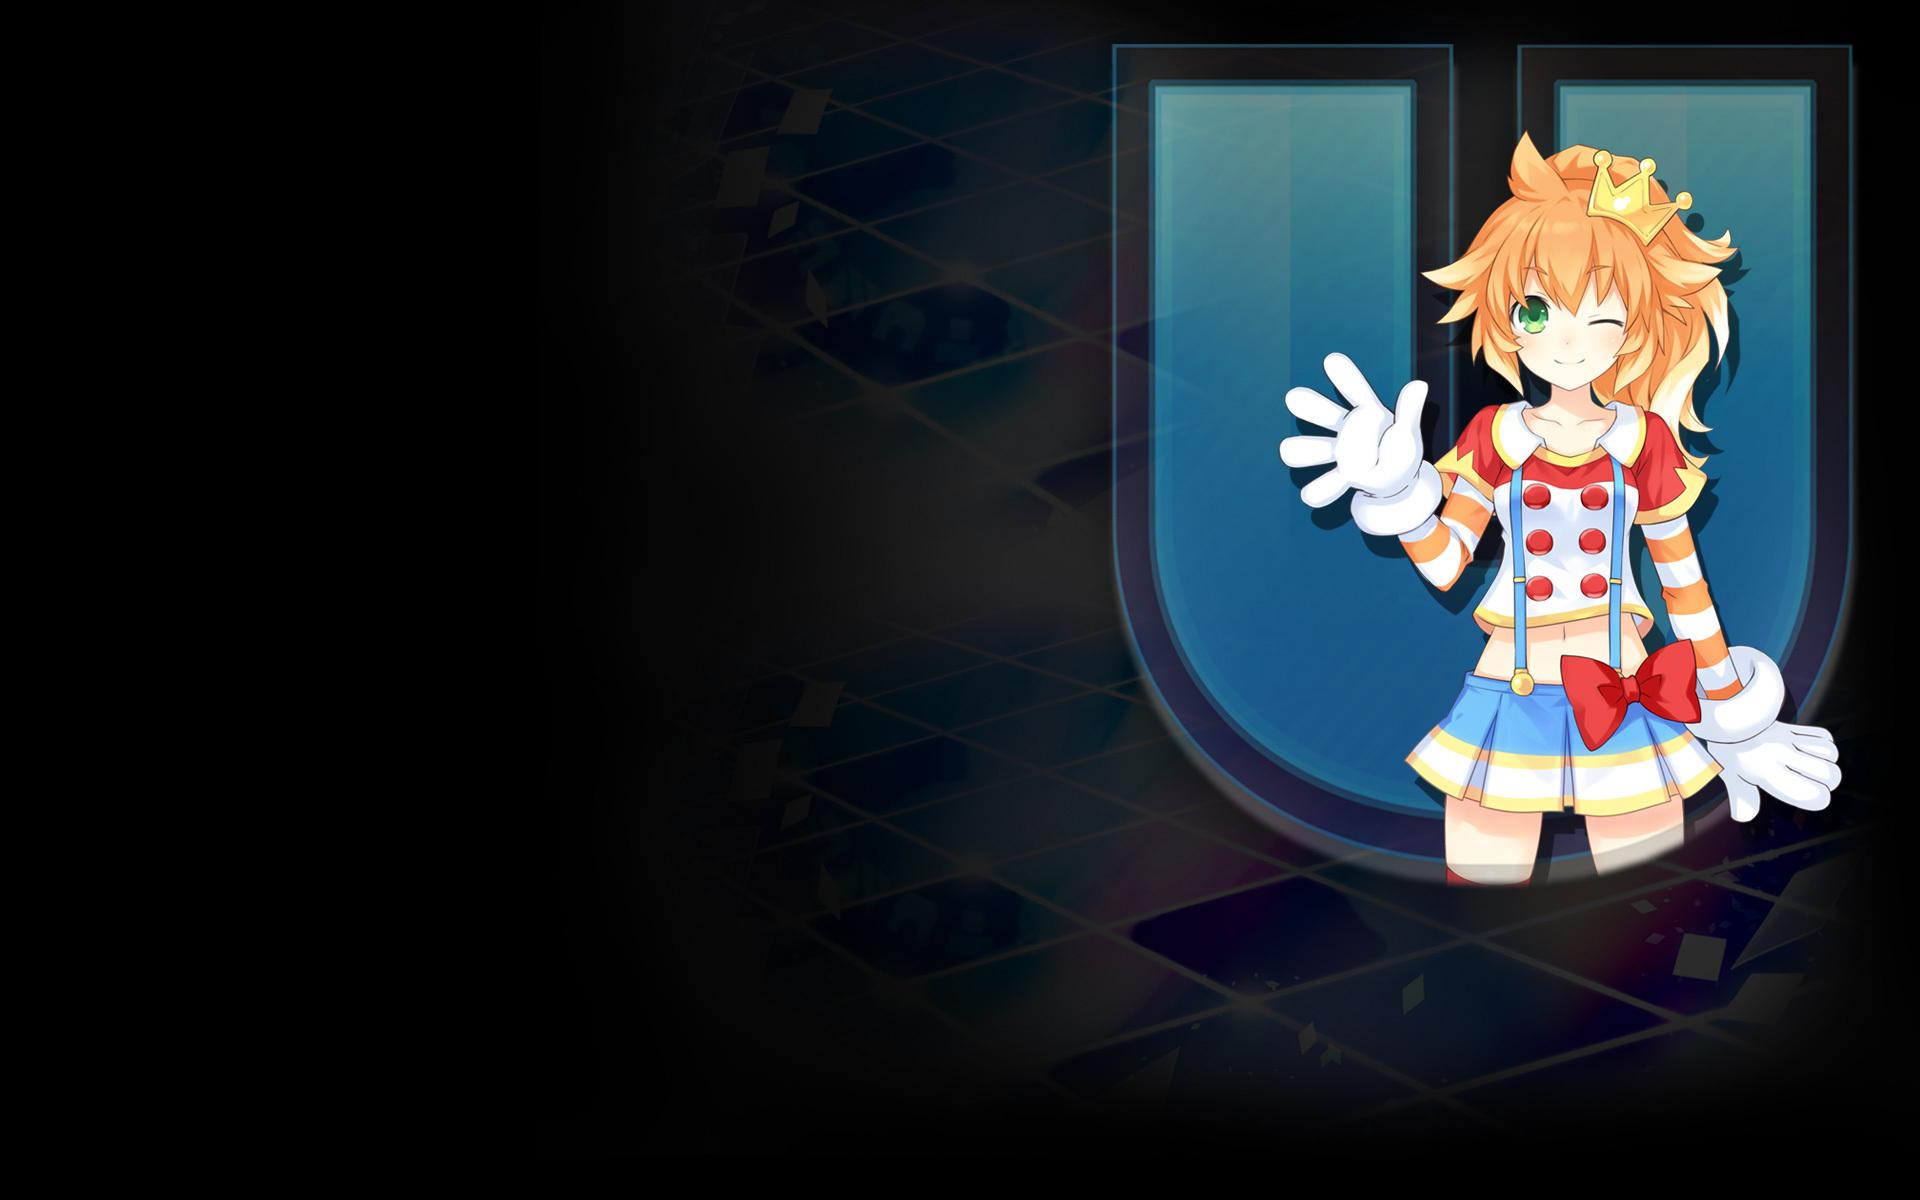 Hyperdimension Neptunia U: Action Unleashed Wallpaper 014 – Famitsu BG